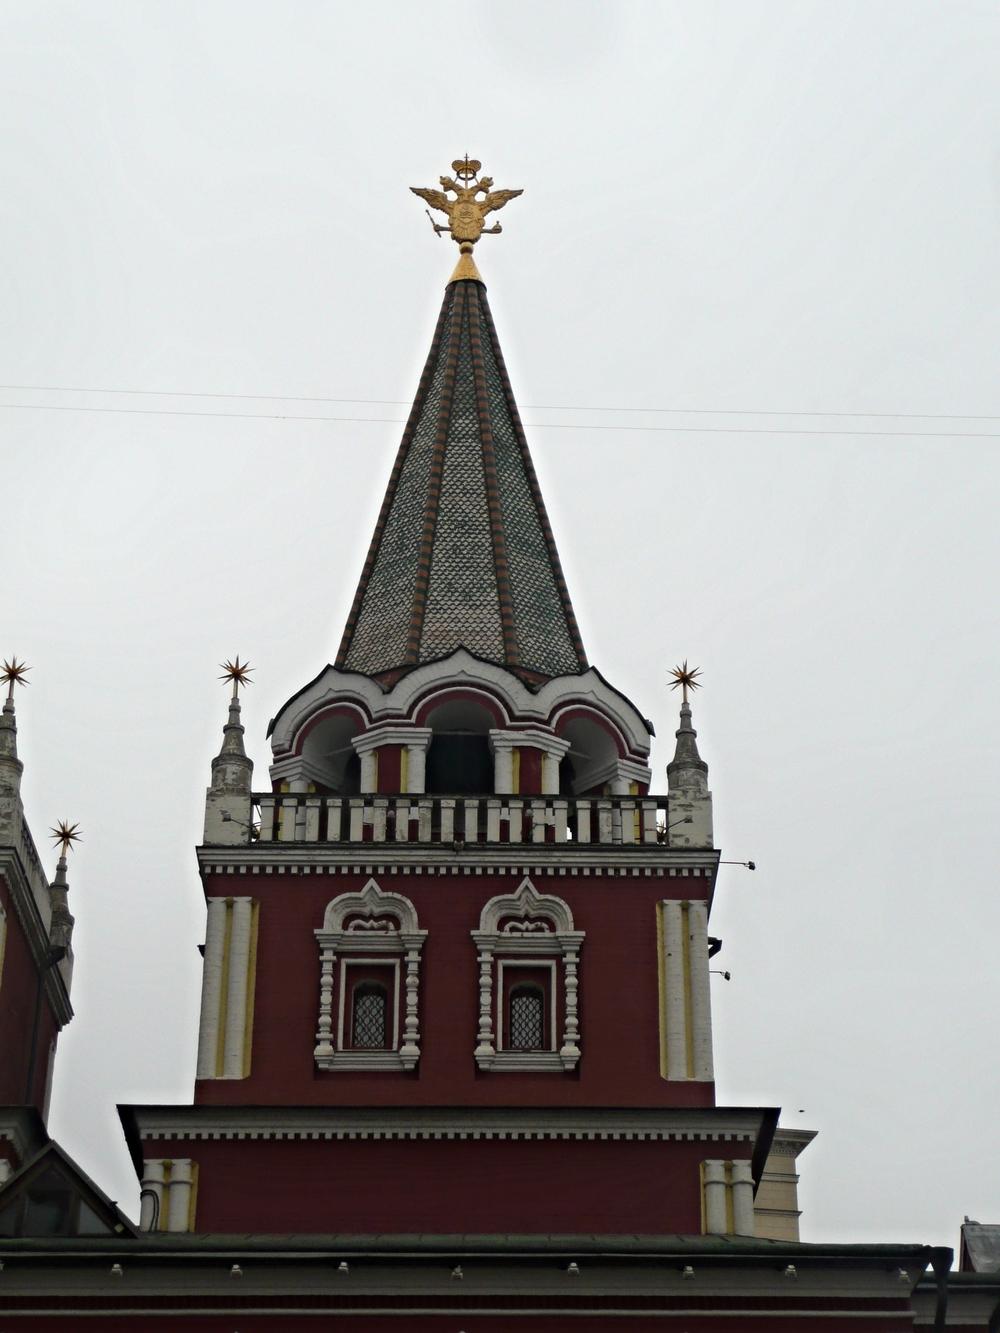 Spassky Tower of the Kremlin